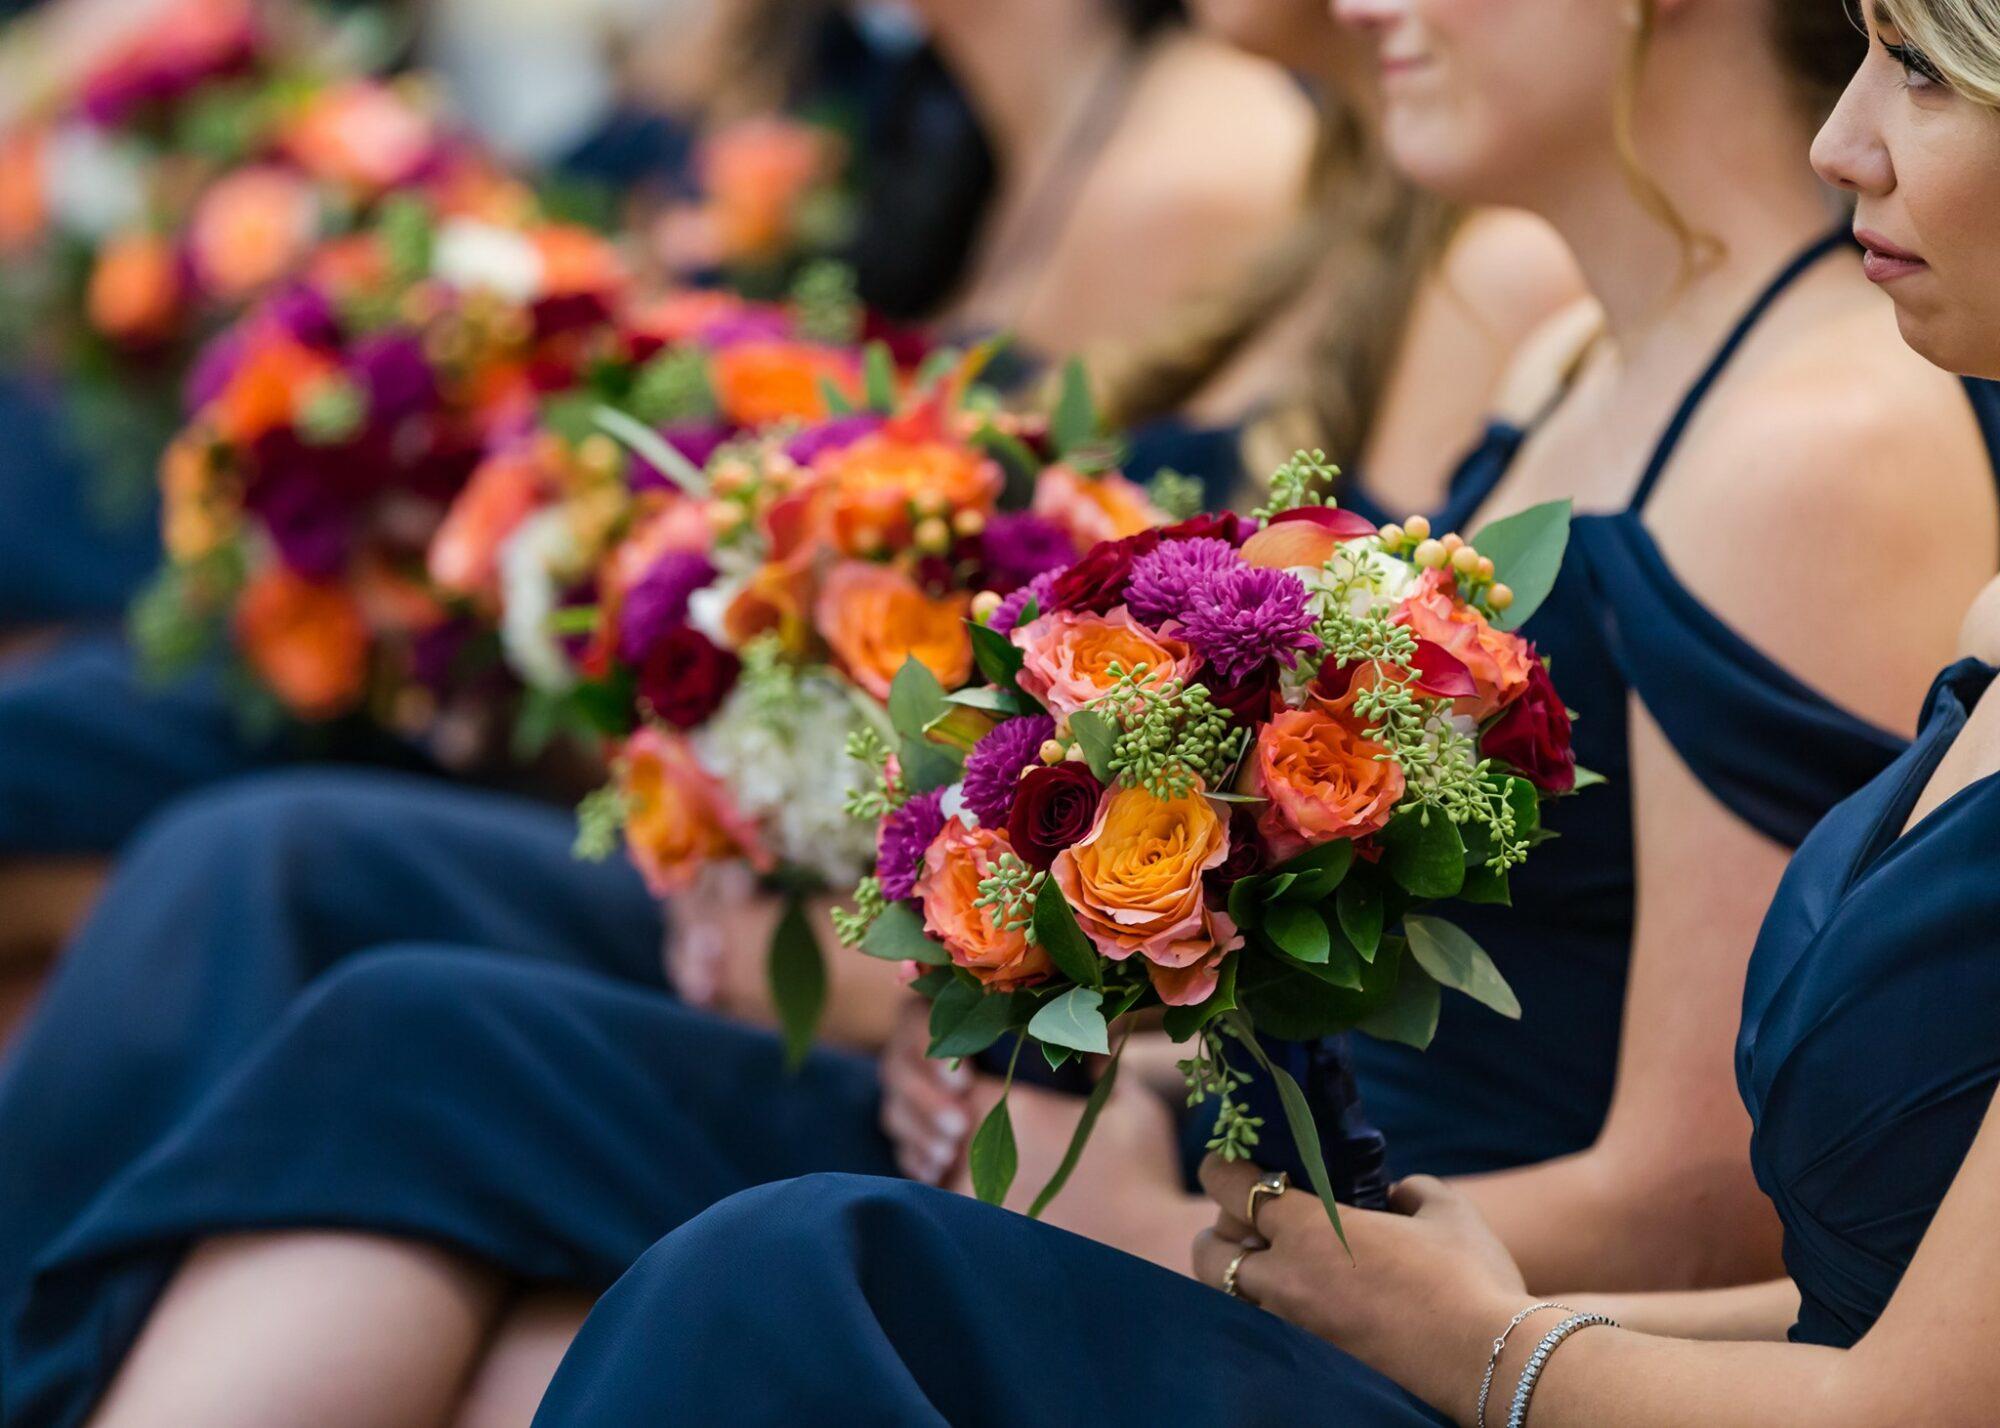 571-Bayville florist wedding flowers NJ